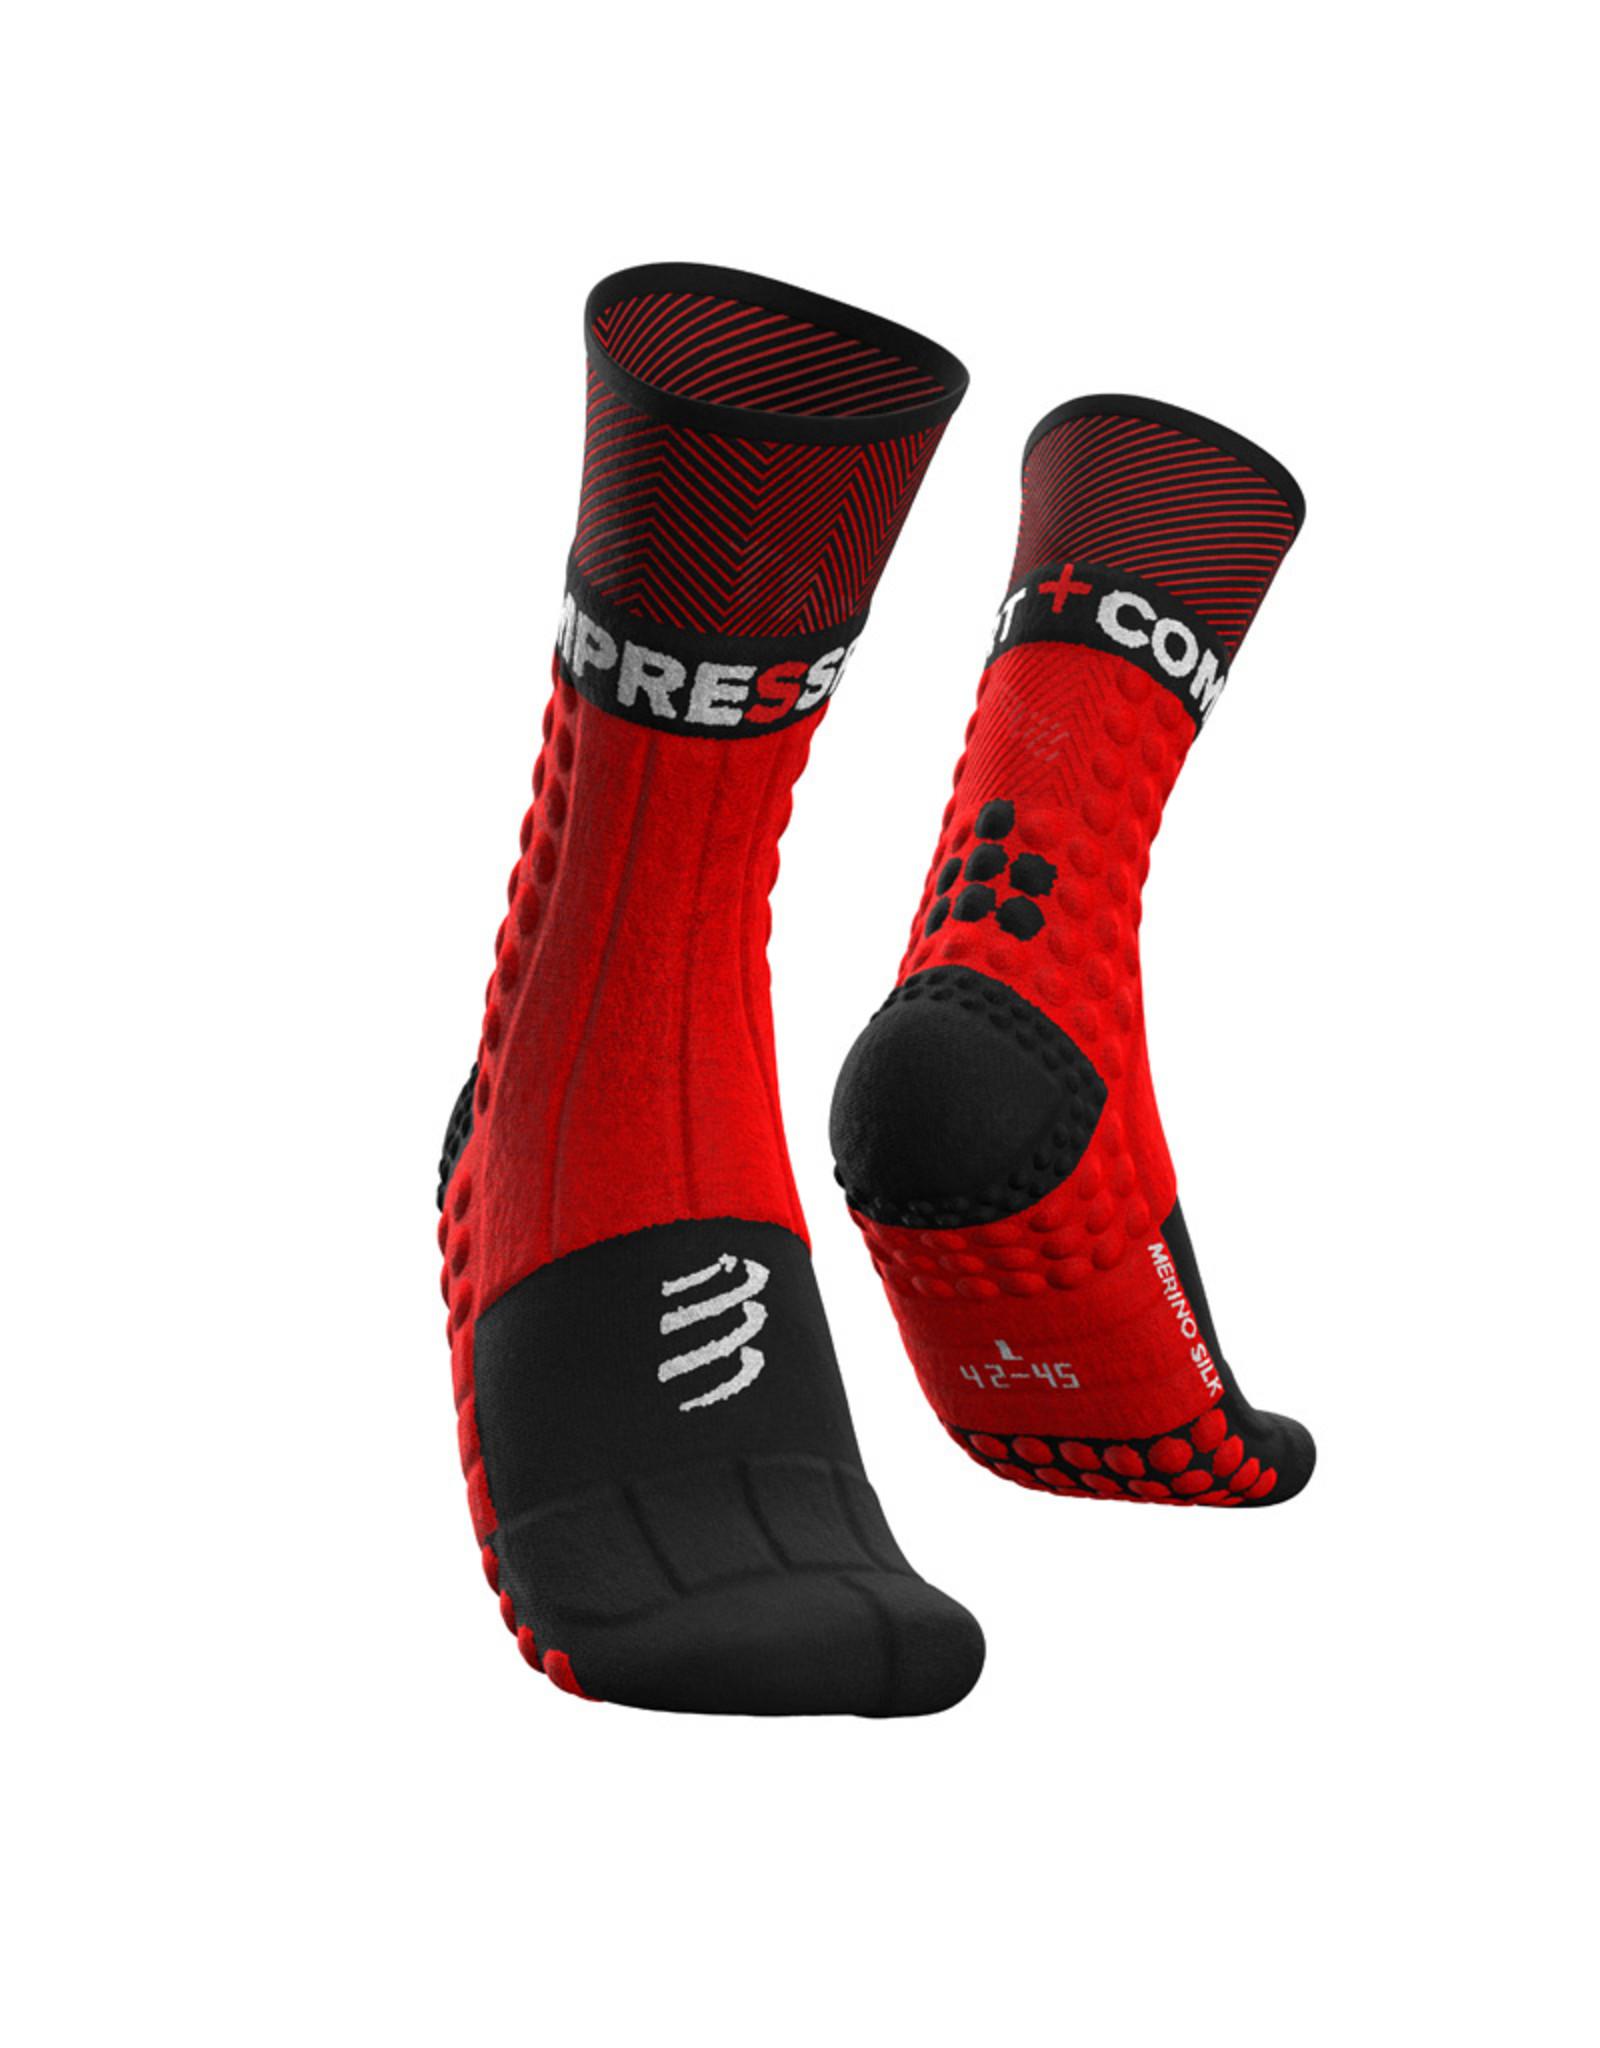 Compressport Pro Racing Socks Winter Trail Hardloopsokken - Zwart/Rood